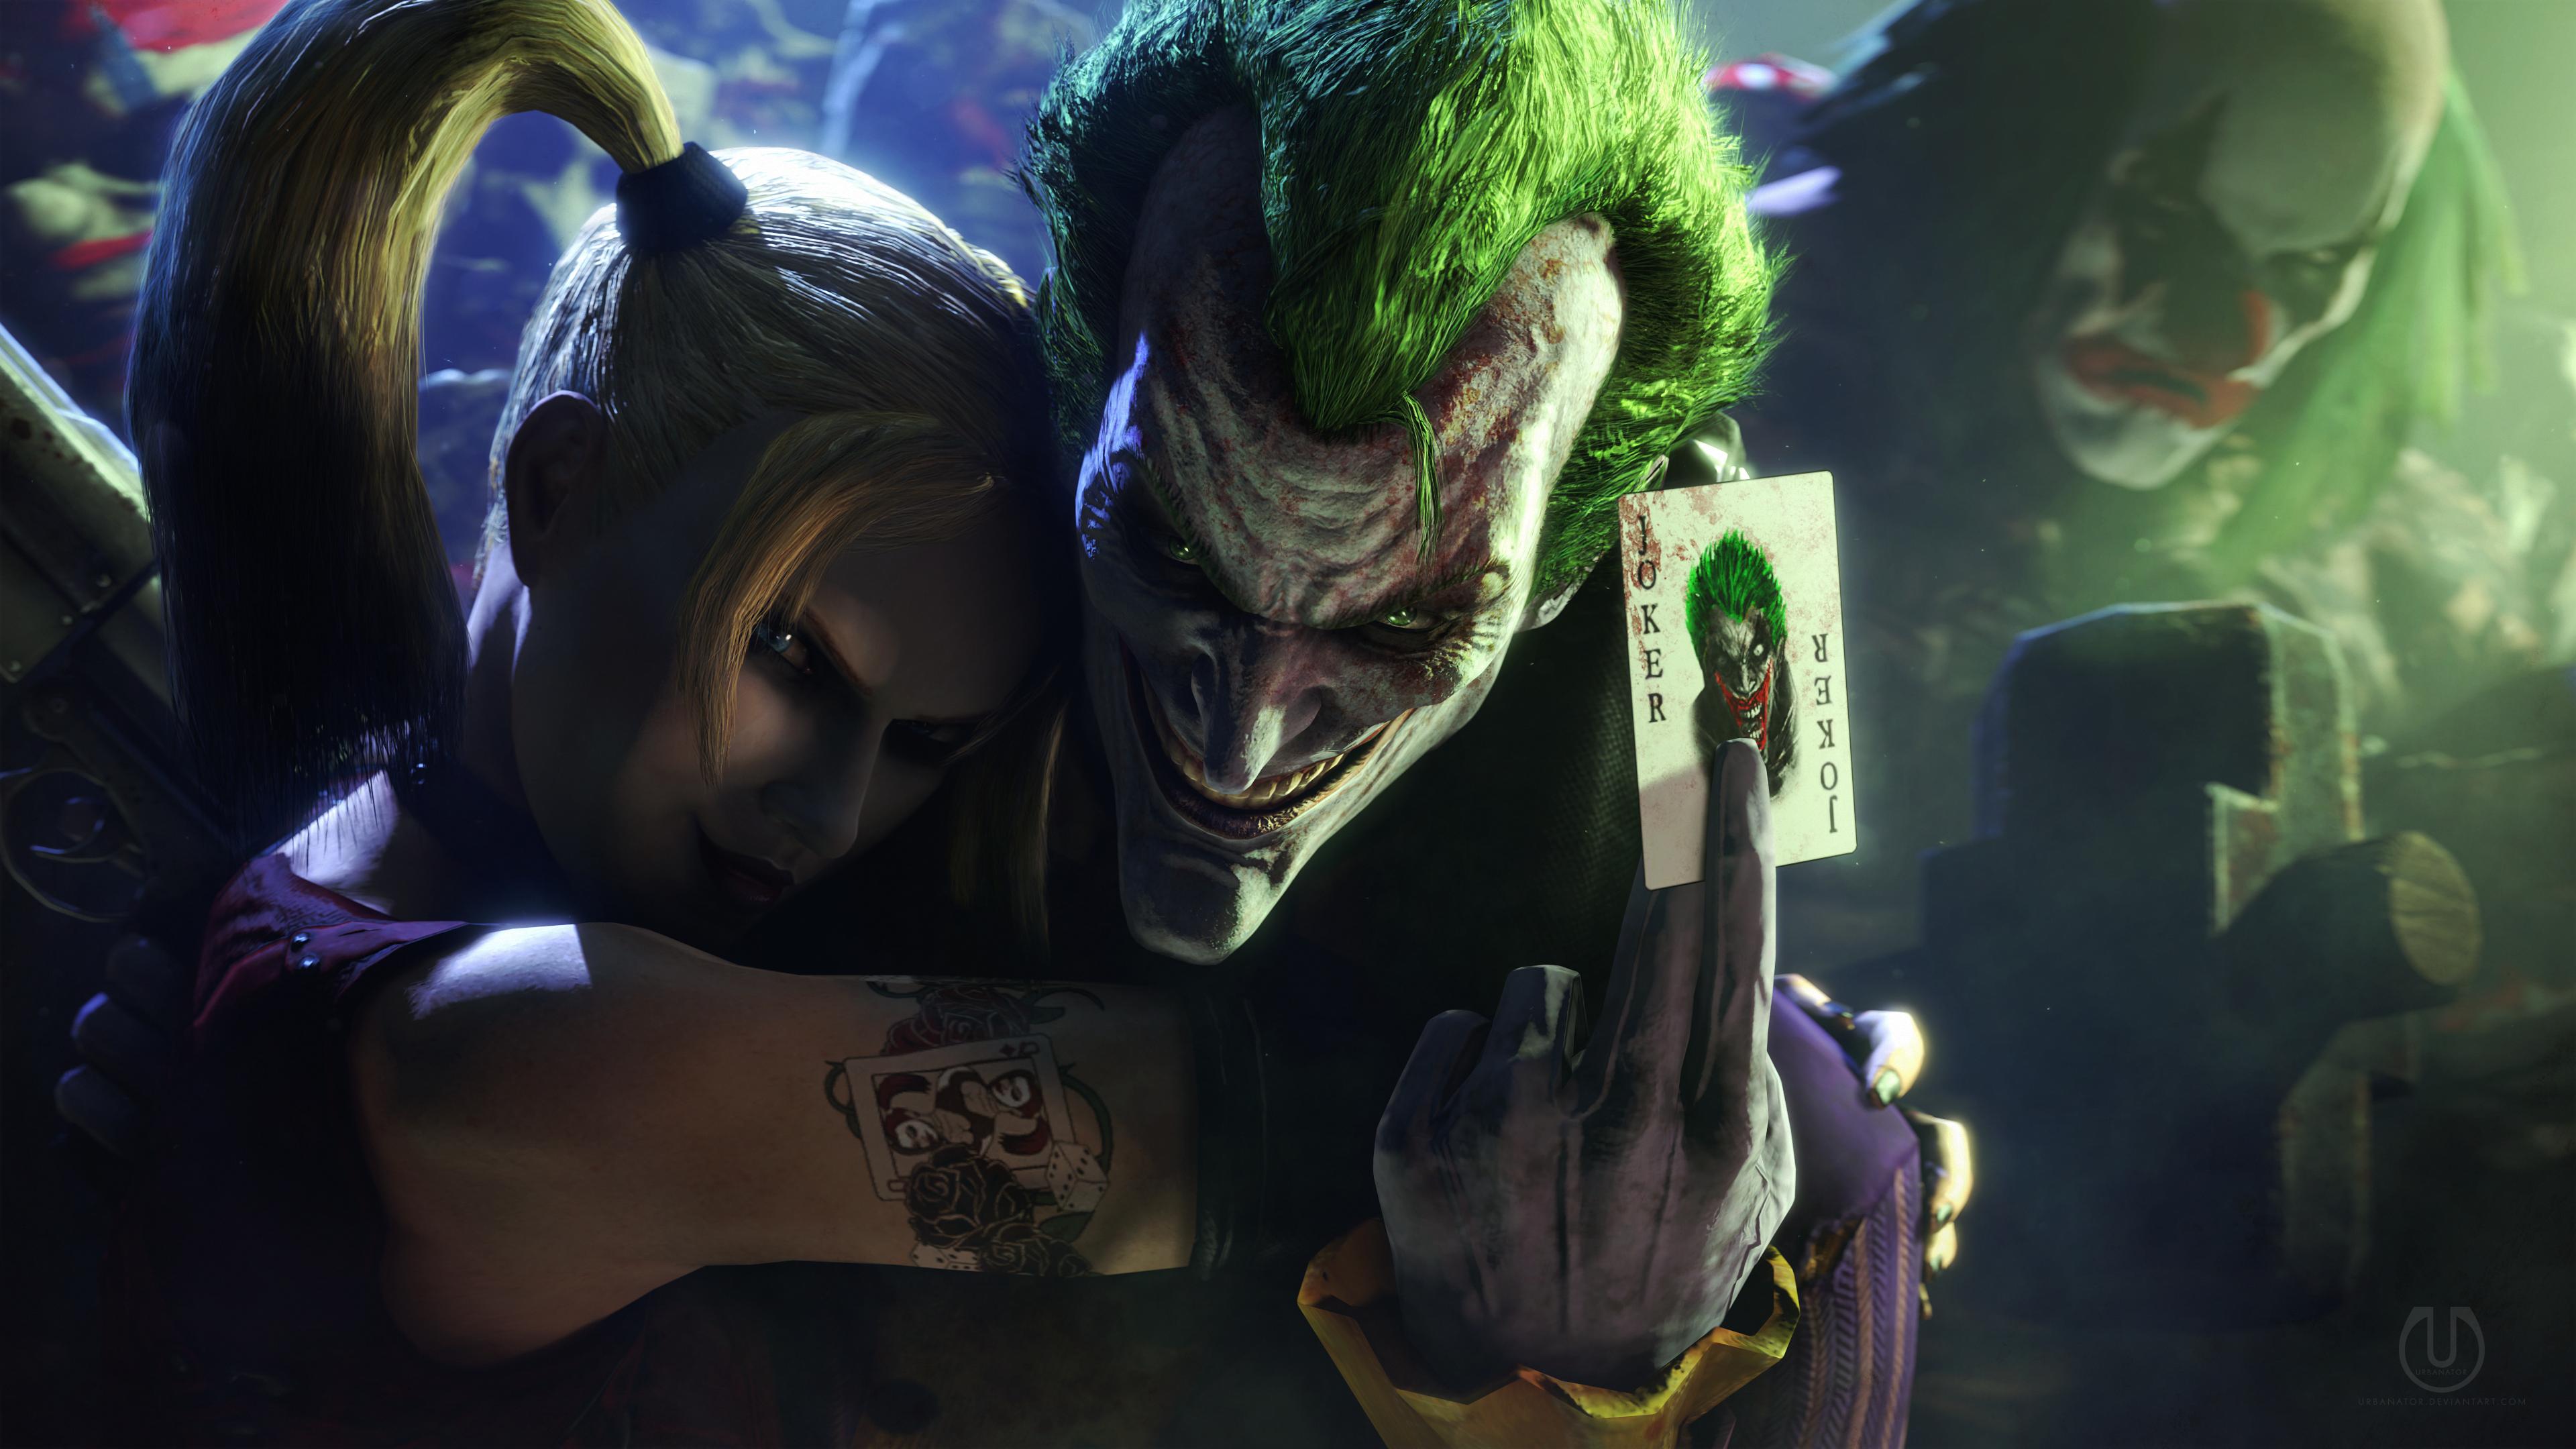 Joker and Harley Quinn | Batman by Urbanator